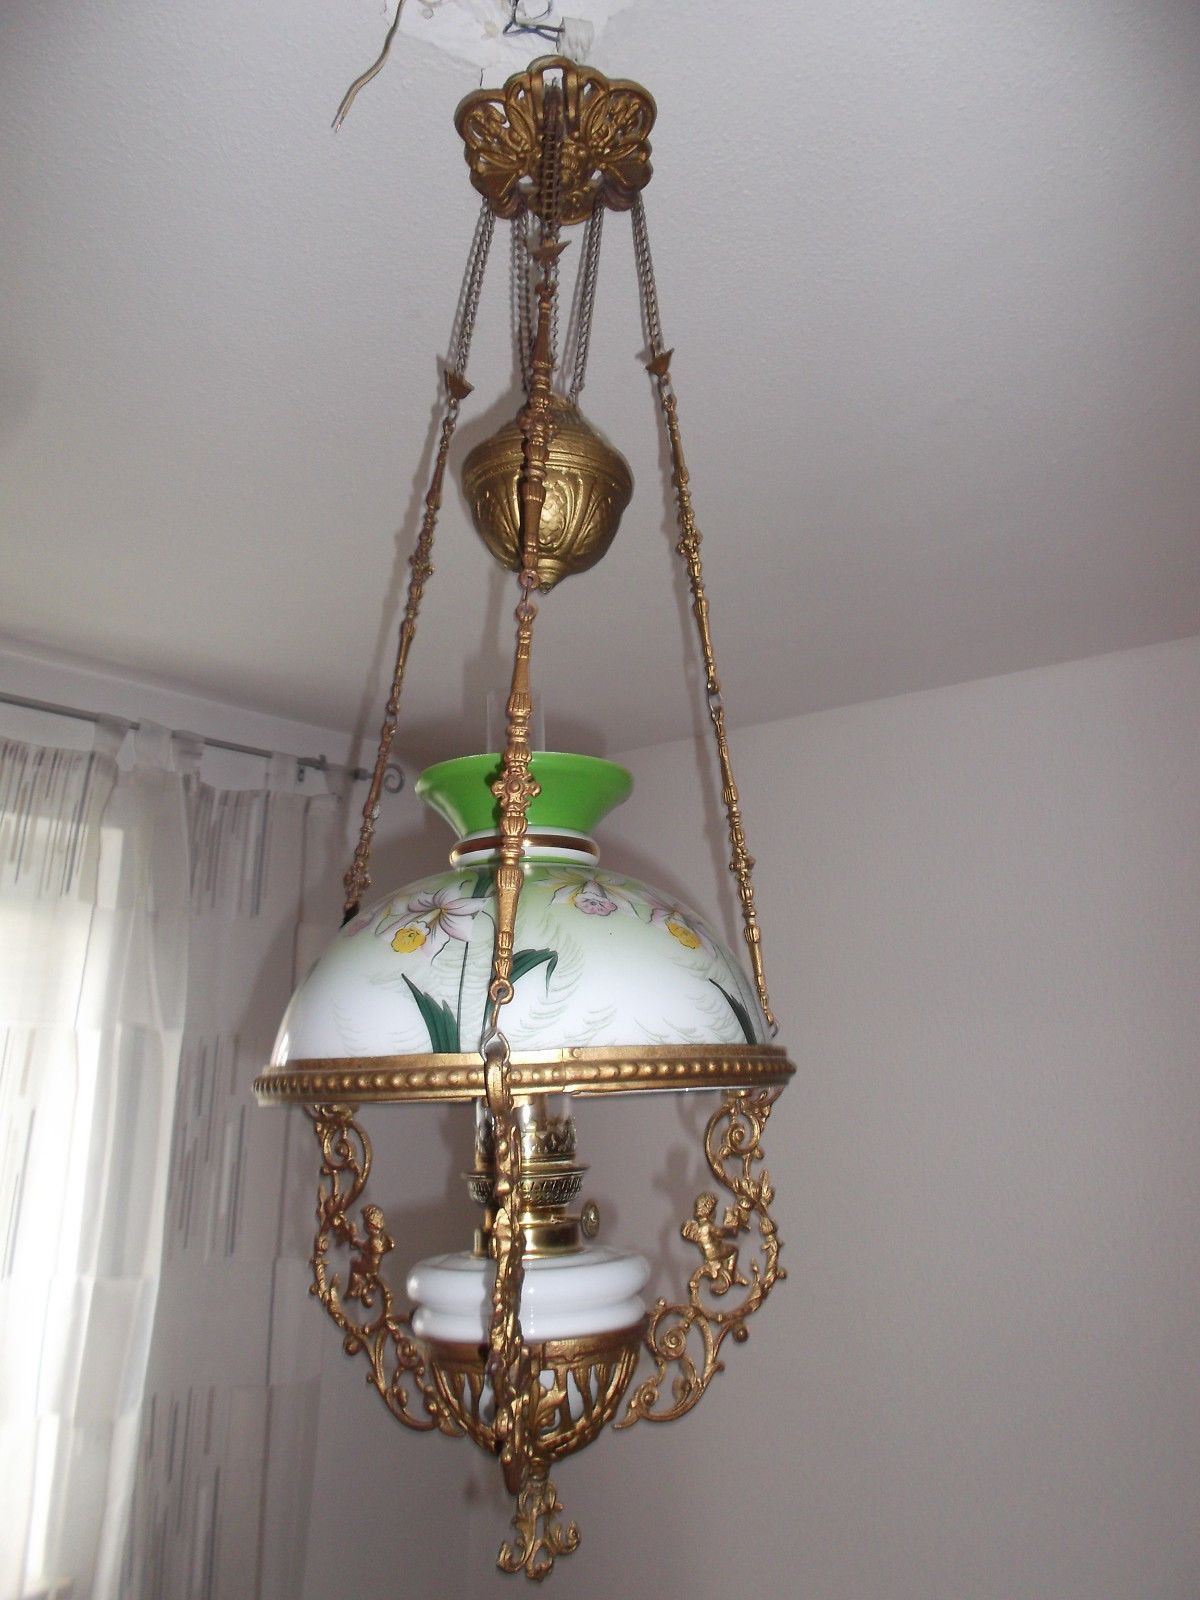 Hanging Oil Petroleum Kerosene Lamp Shade Gaudard A P Morbier ...